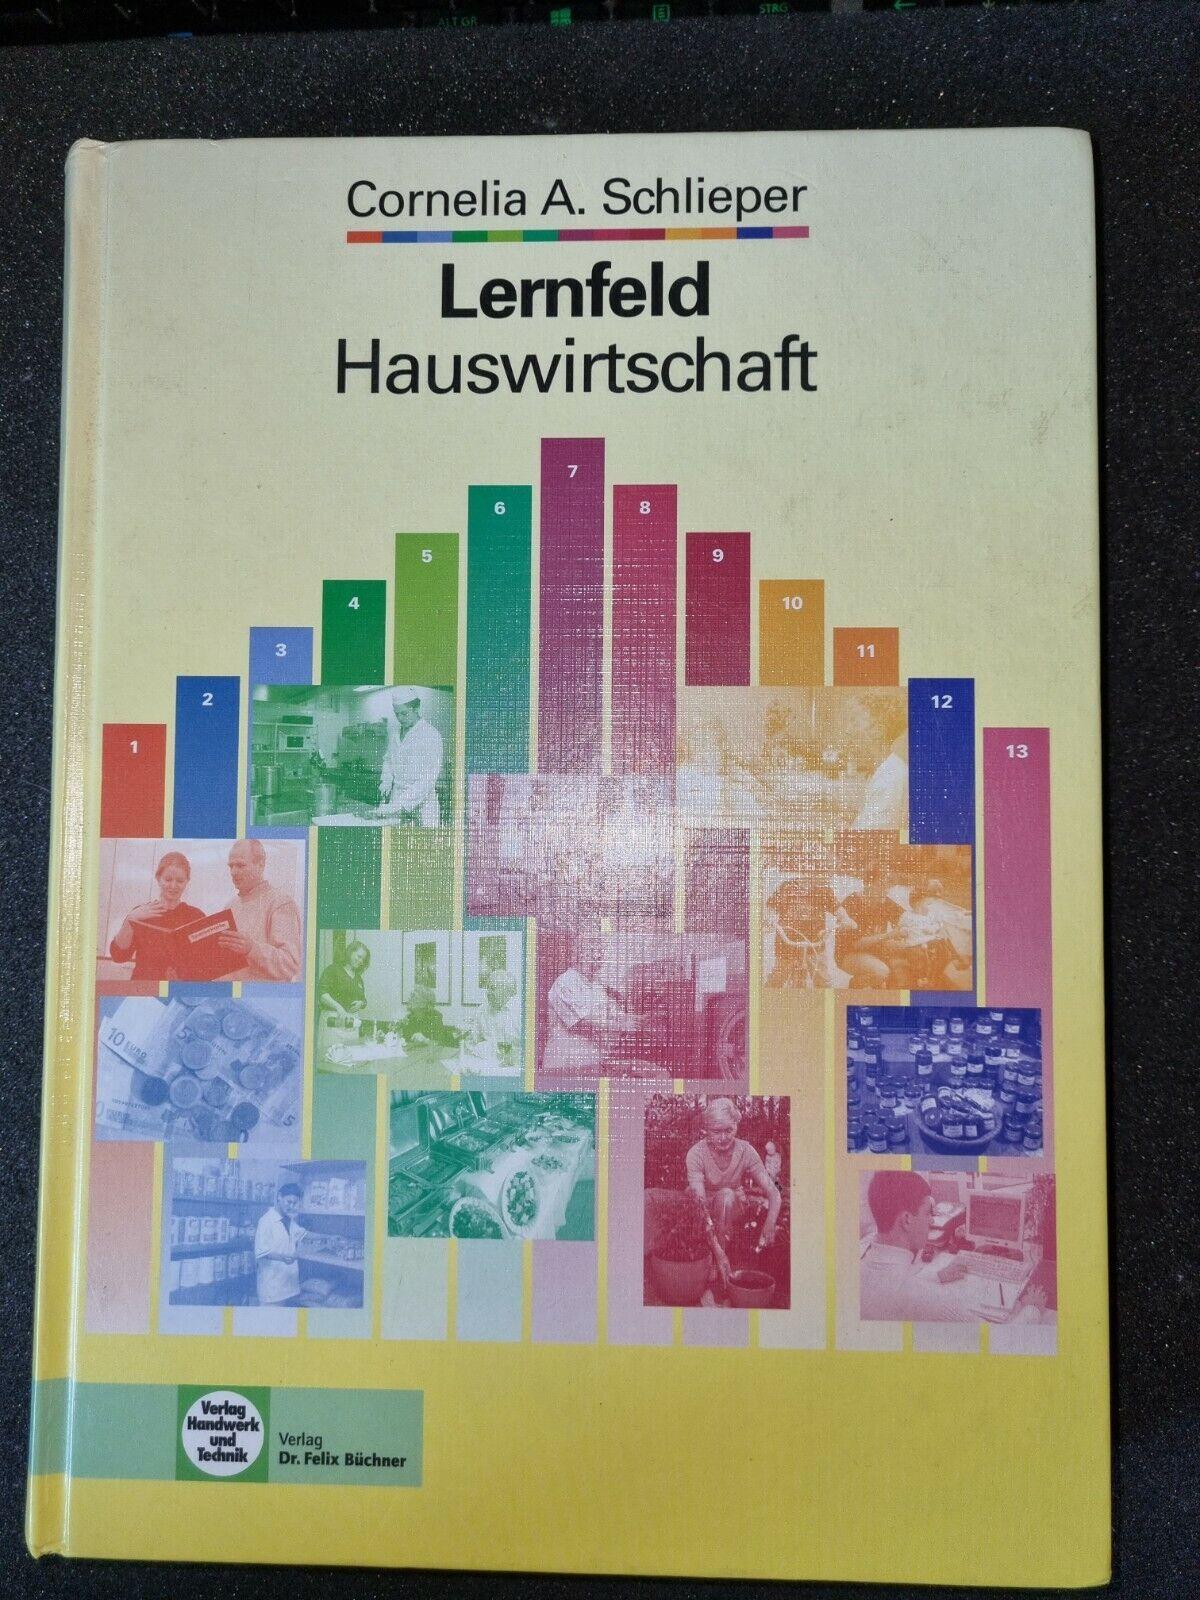 Lernfeld Hauswirtschaft - Cornelia A. Schlieper - Cornelia A. Schöieper